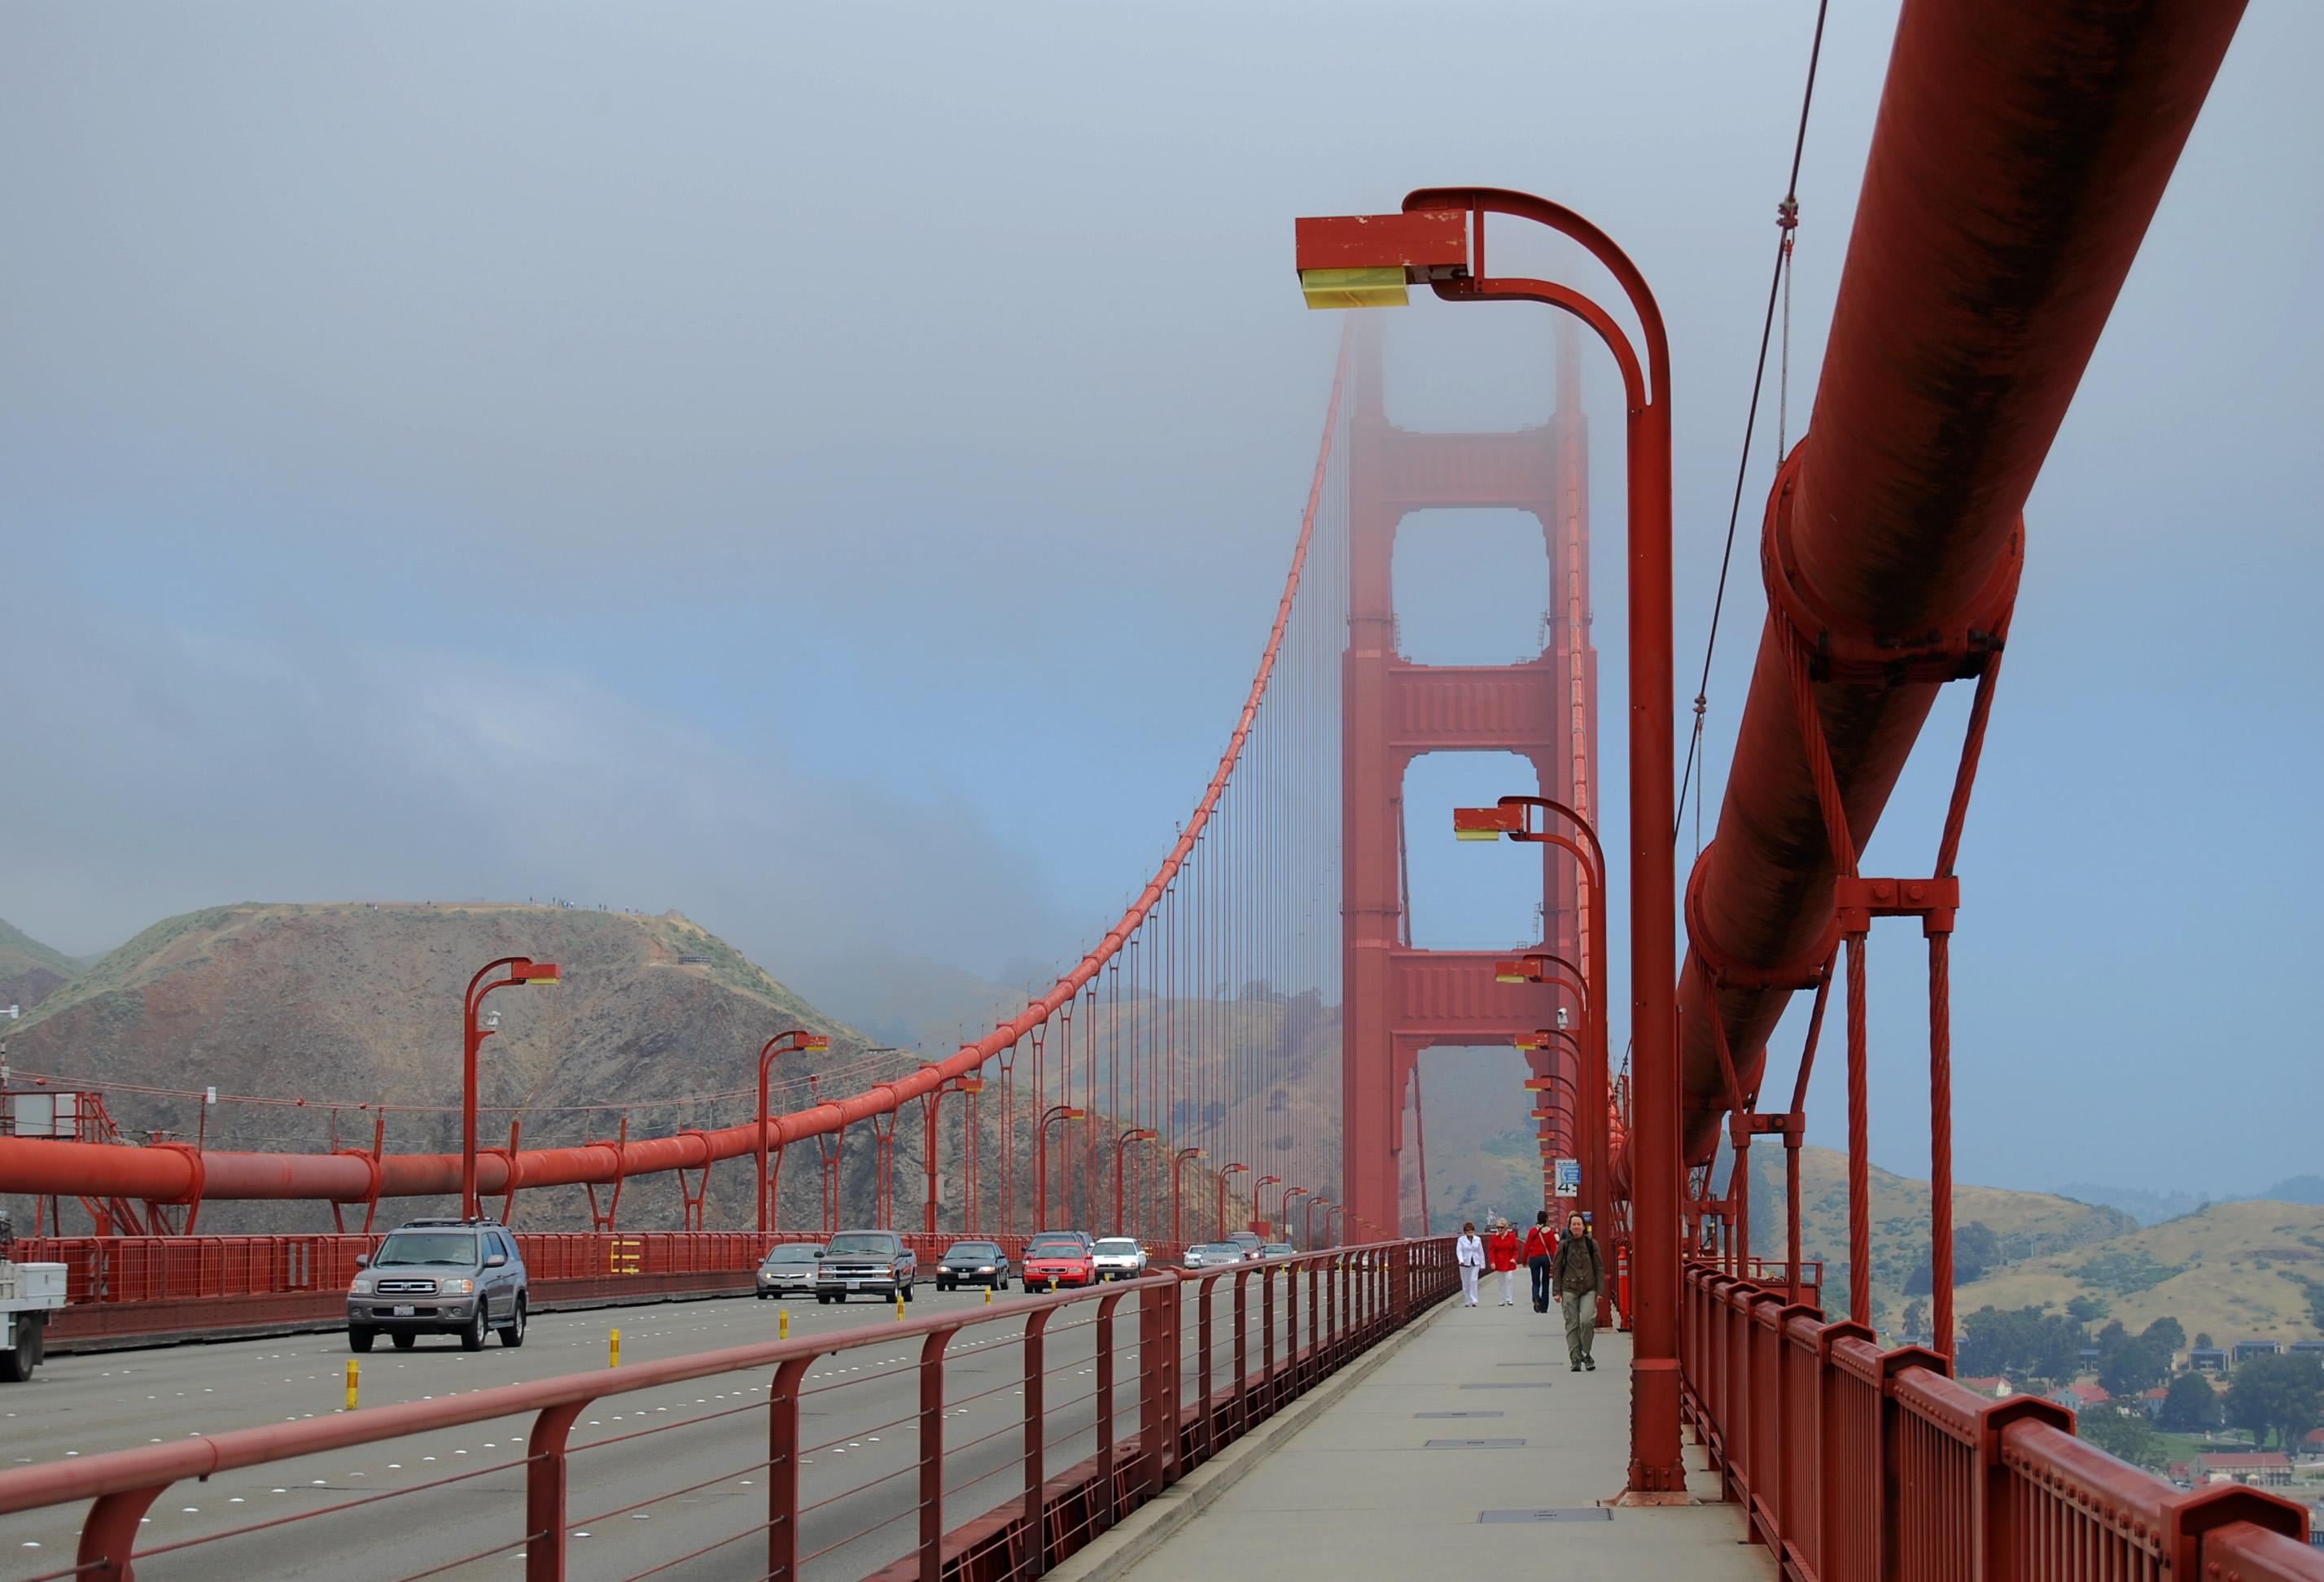 Walking the Golden Gate Bridge